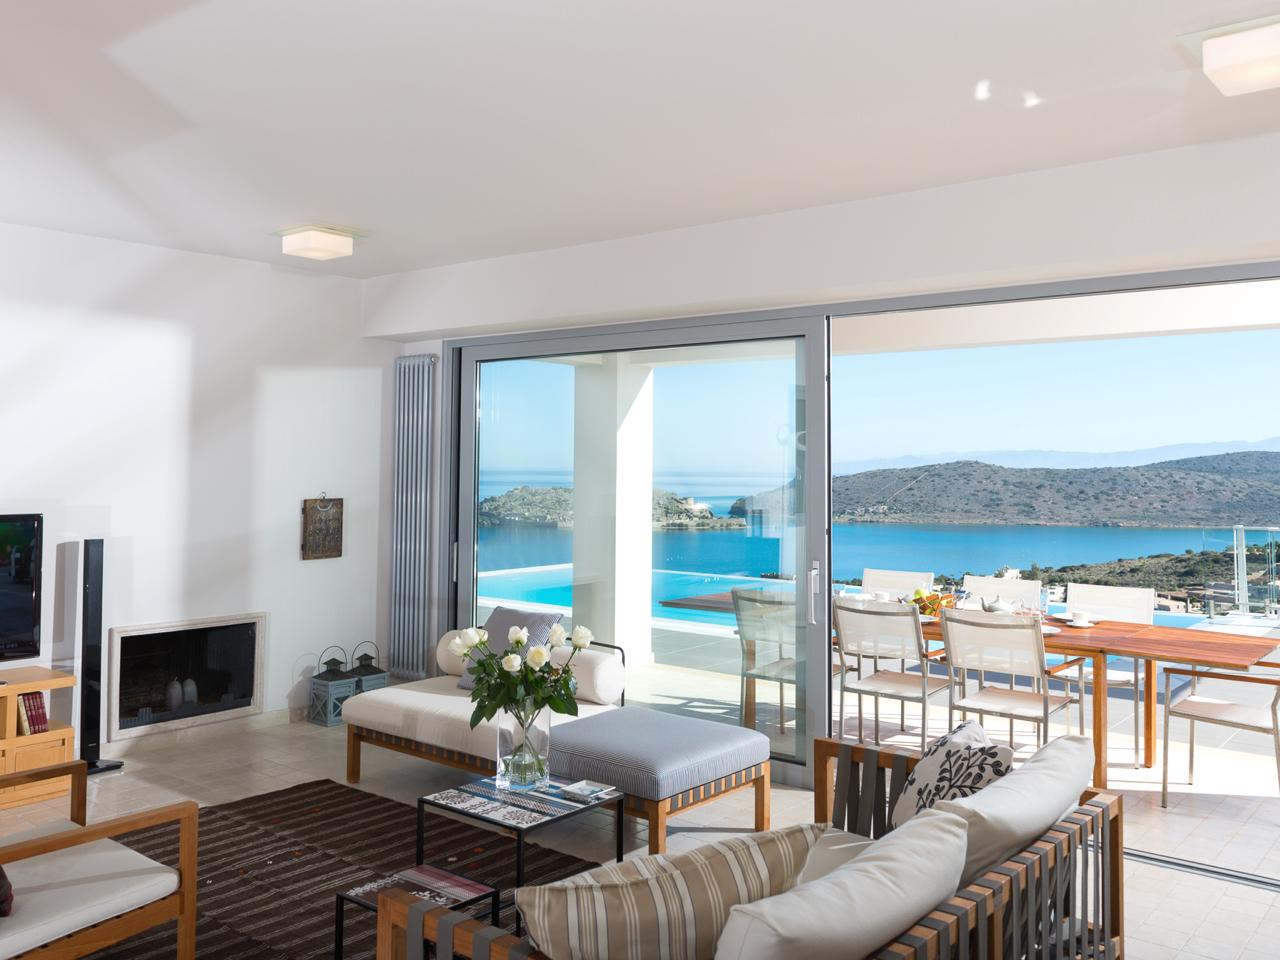 Stunning Sea Views & Relaxing Summer Days - Elounda Luxury Villas